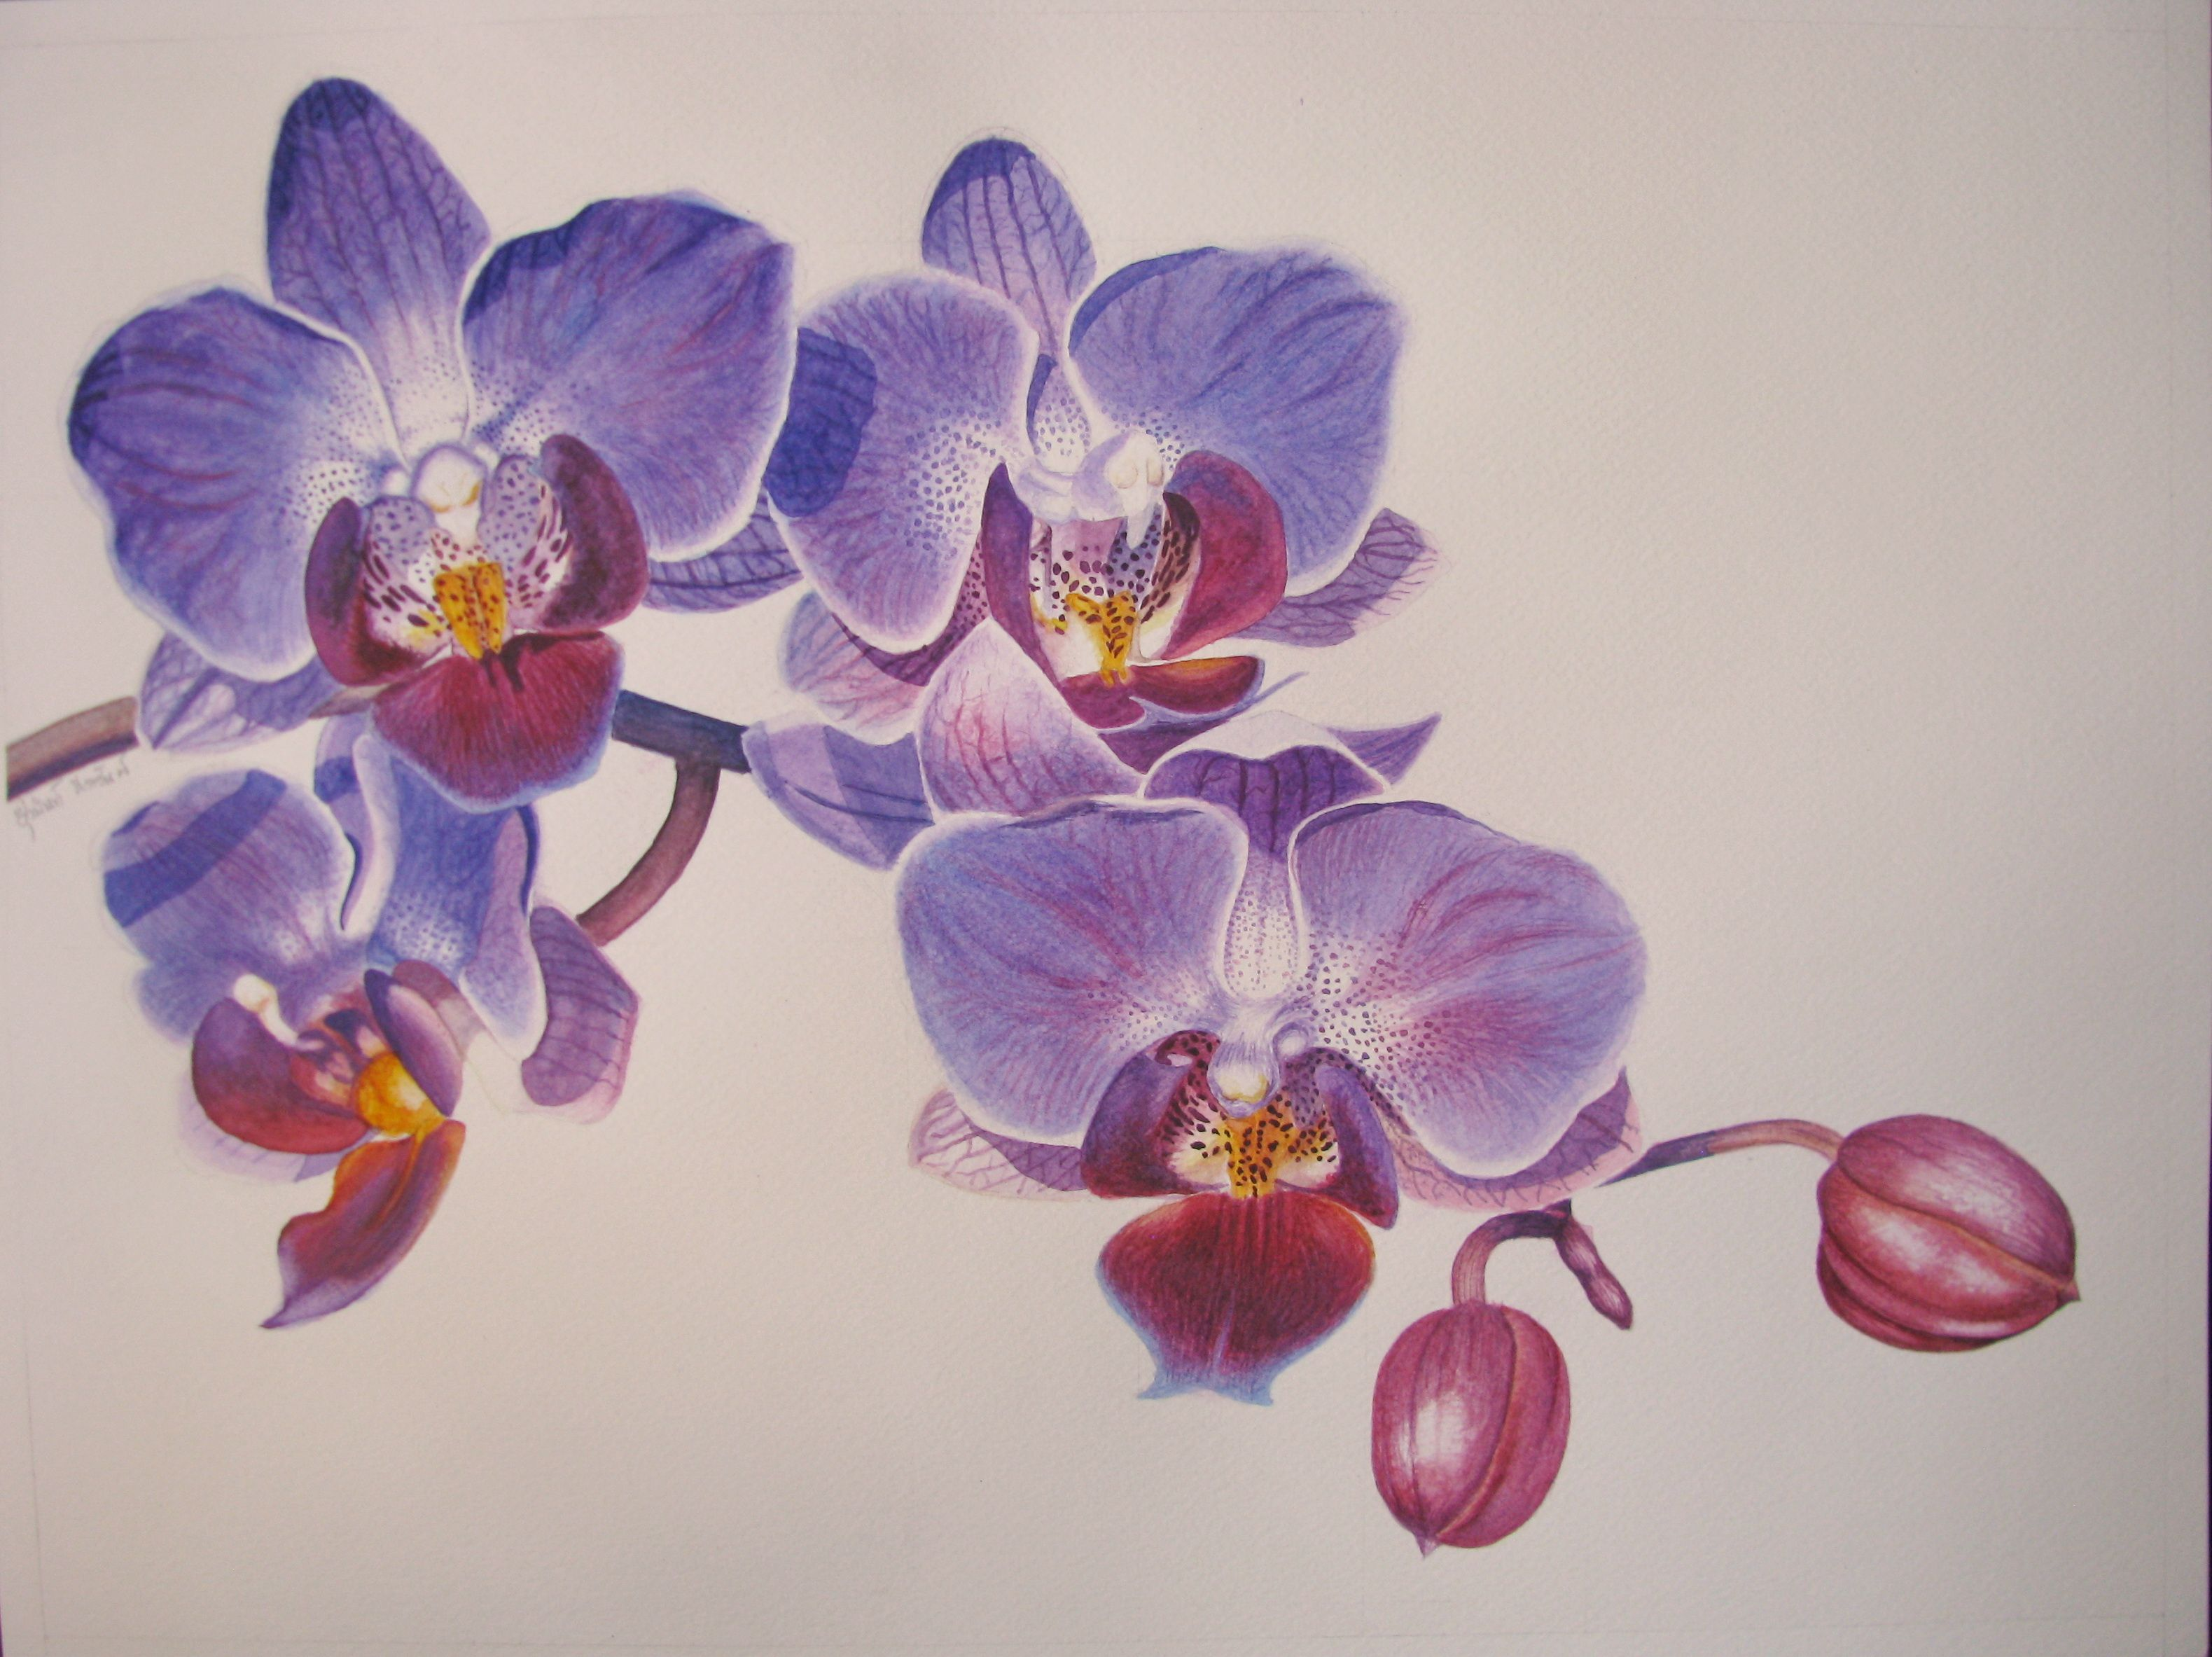 Purple orchid 14 x 19 in watercolor on paper artist yuwanunn purple orchid 14 x 19 in watercolor on paper artist yuwanunn narasun biocorpaavc